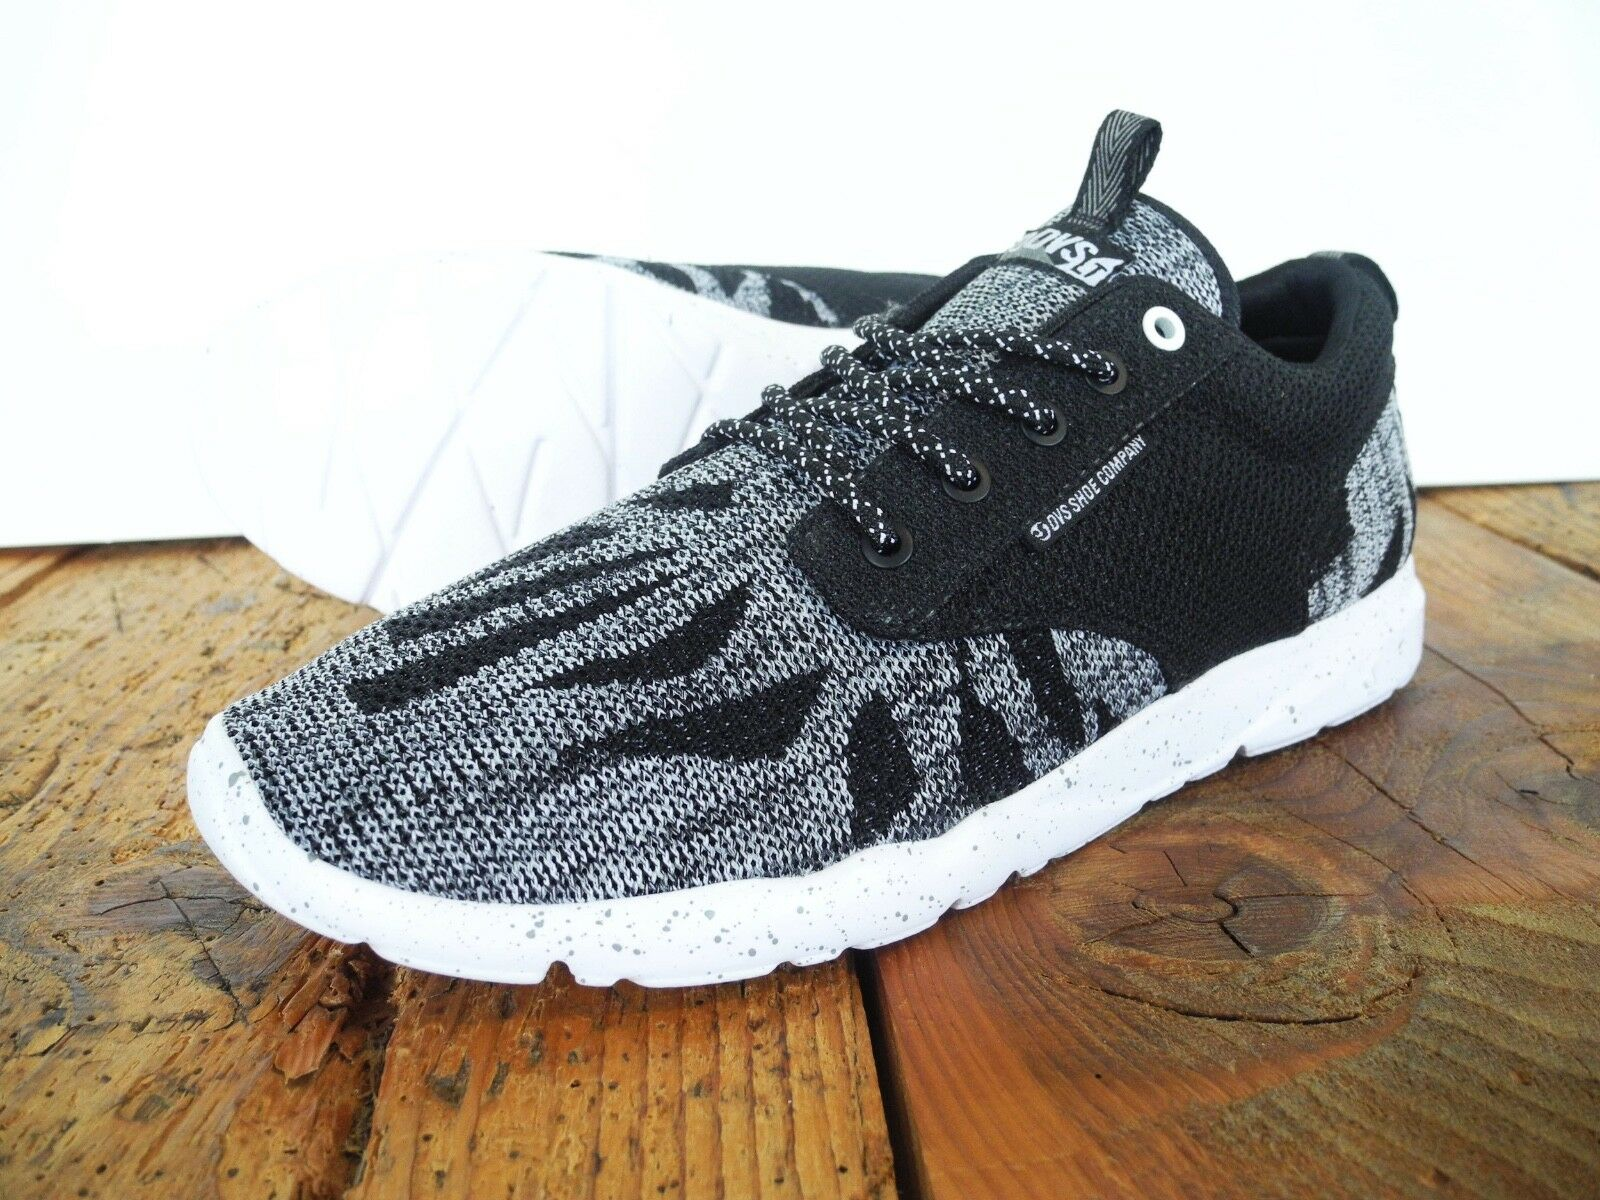 DVS Schuhe PREMIER 2.0 PLUS SNEAKER NEU BLACK-Weiß US Schuhe 9 EUR 42.5 DVS Schuhe US 61abb2